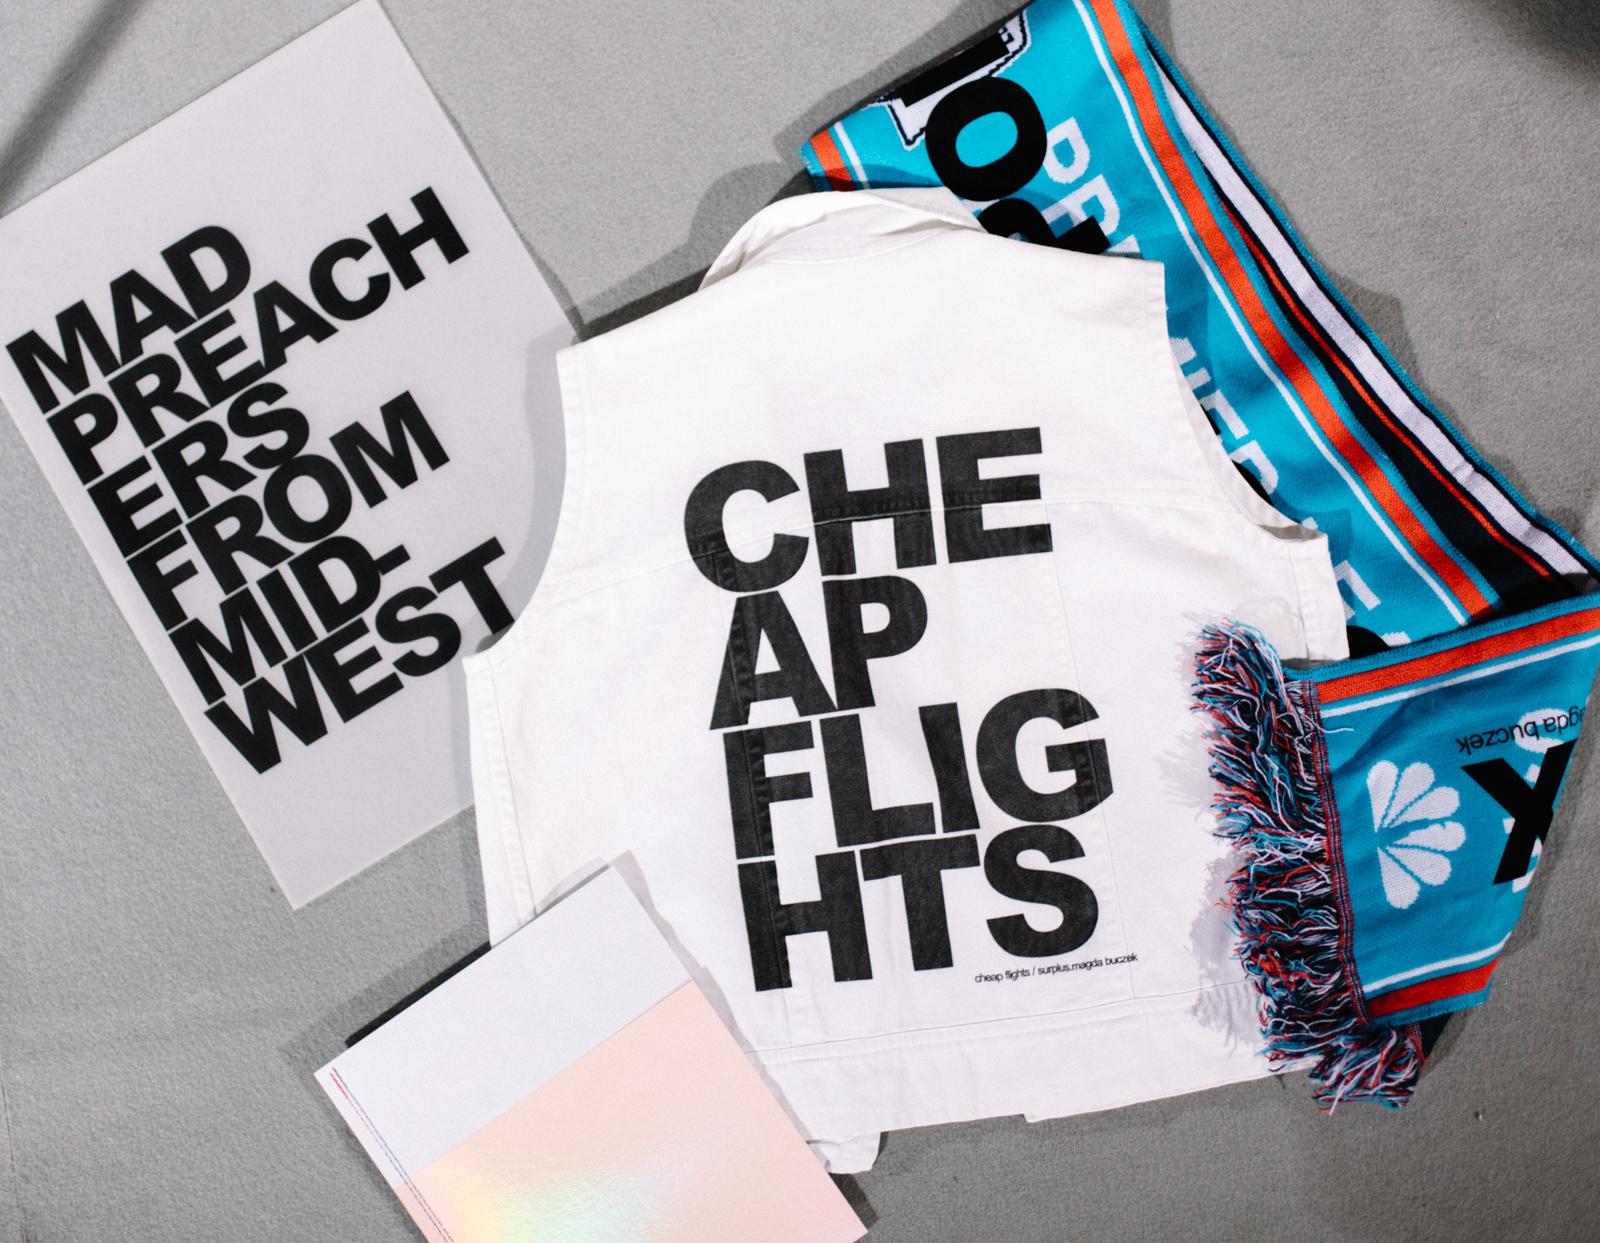 fashion-art-activism.jpg